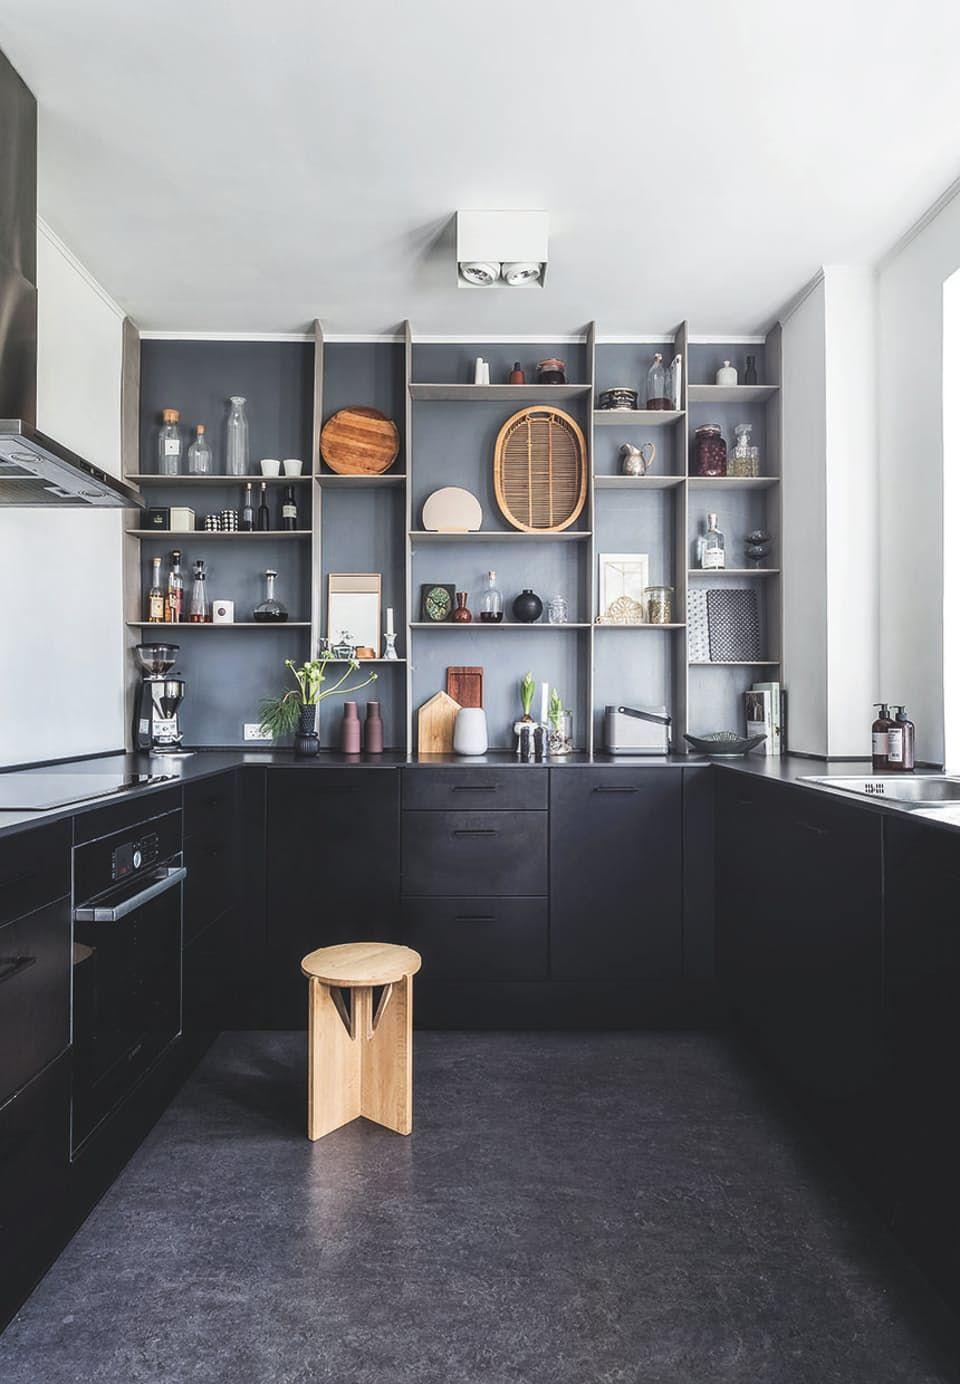 Stilrent hjem med en enkel, nordisk julestil | Küche, Küchen ...